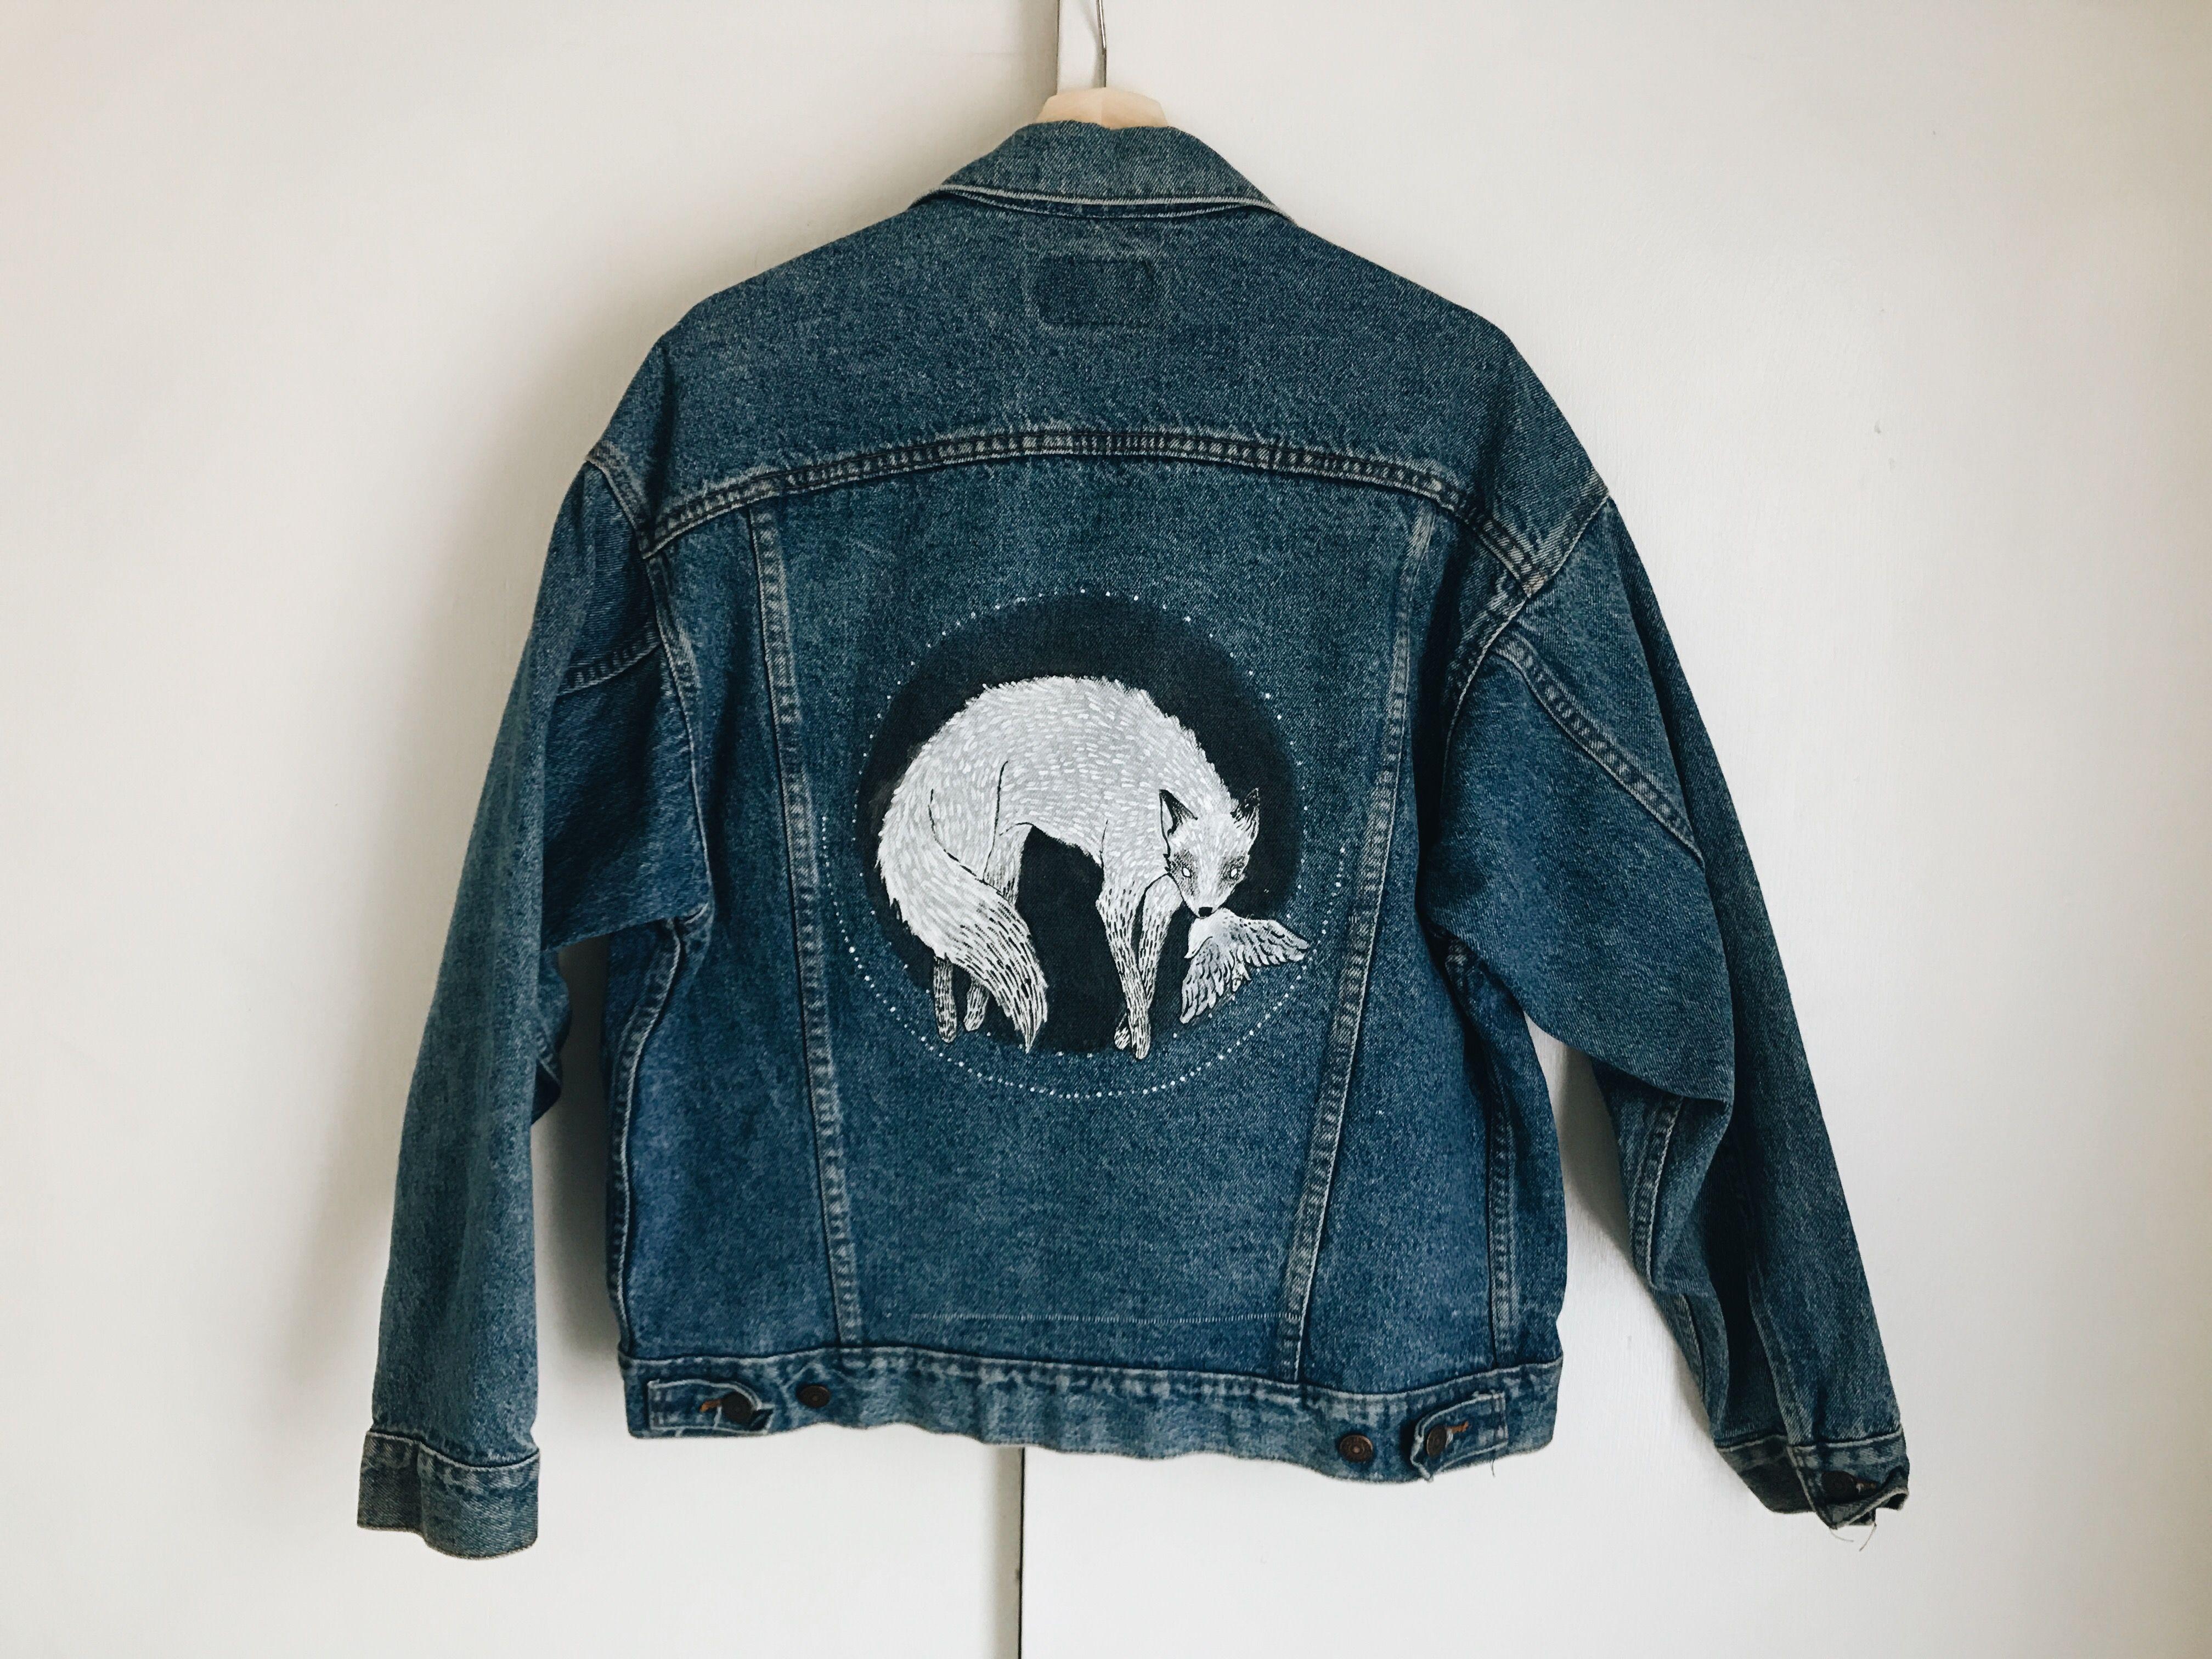 Pin By Mindwerl On Clothes Diy Denim Jacket Art Clothes Denim Jacket Fashion [ 3024 x 4032 Pixel ]